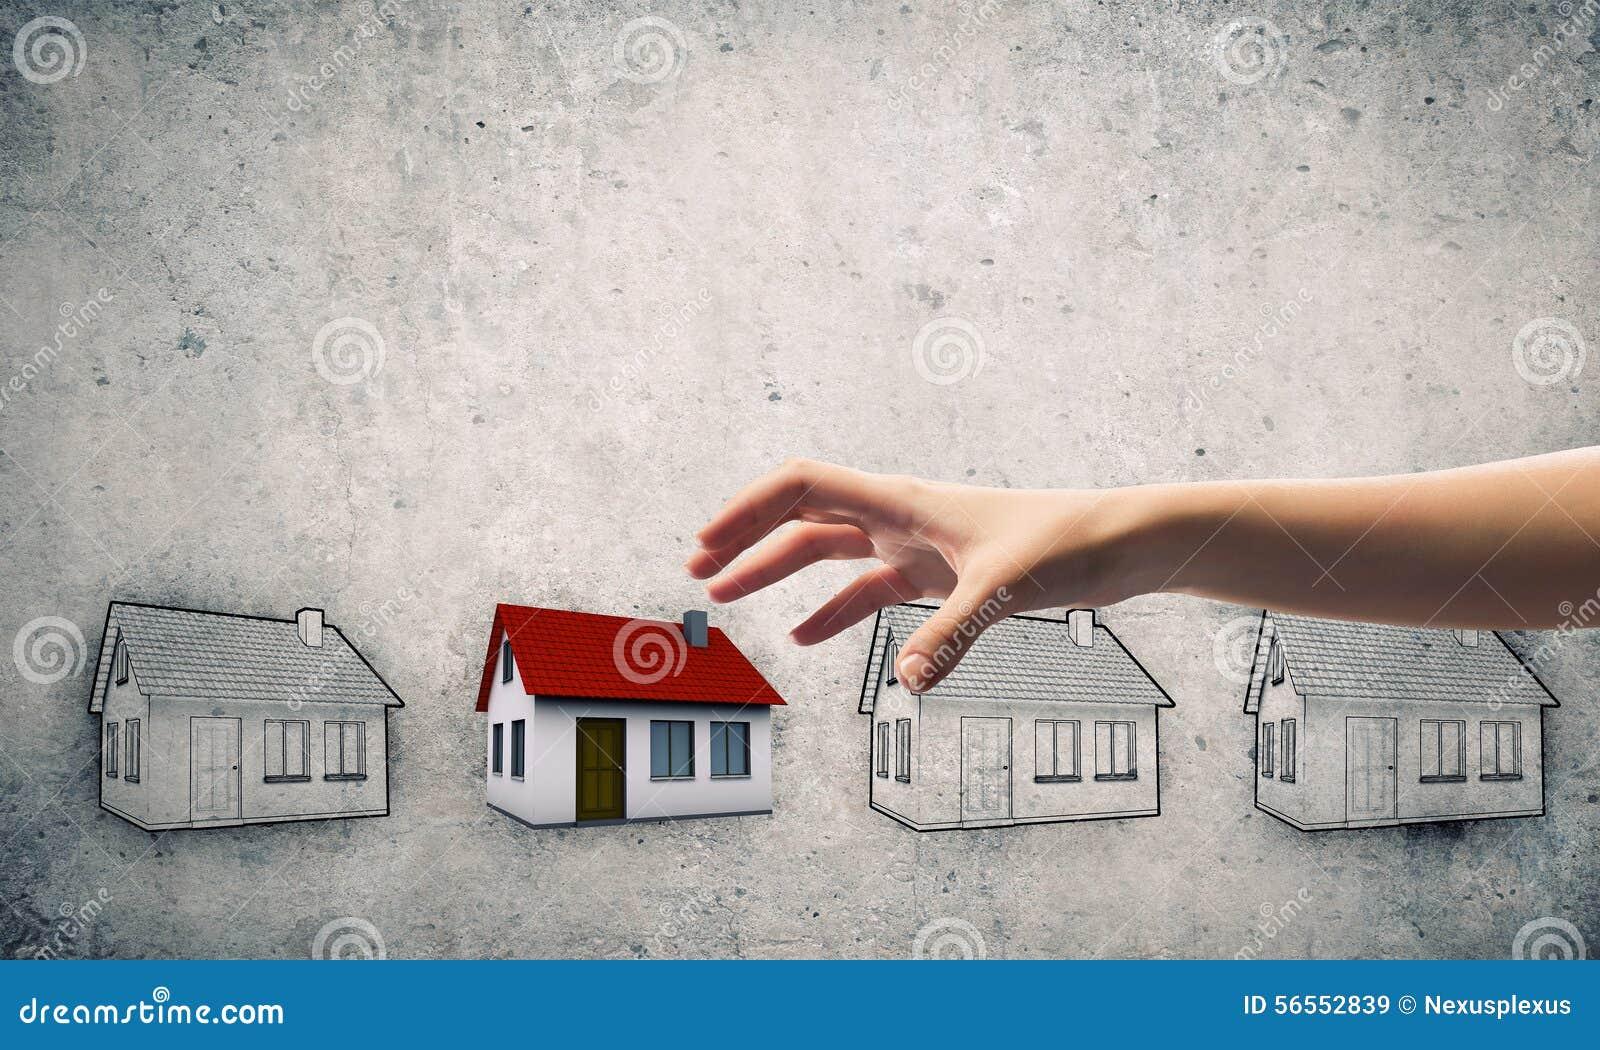 Download Μάζεμα με το χέρι του σπιτιού Στοκ Εικόνα - εικόνα από σύλληψη, σύμβολο: 56552839